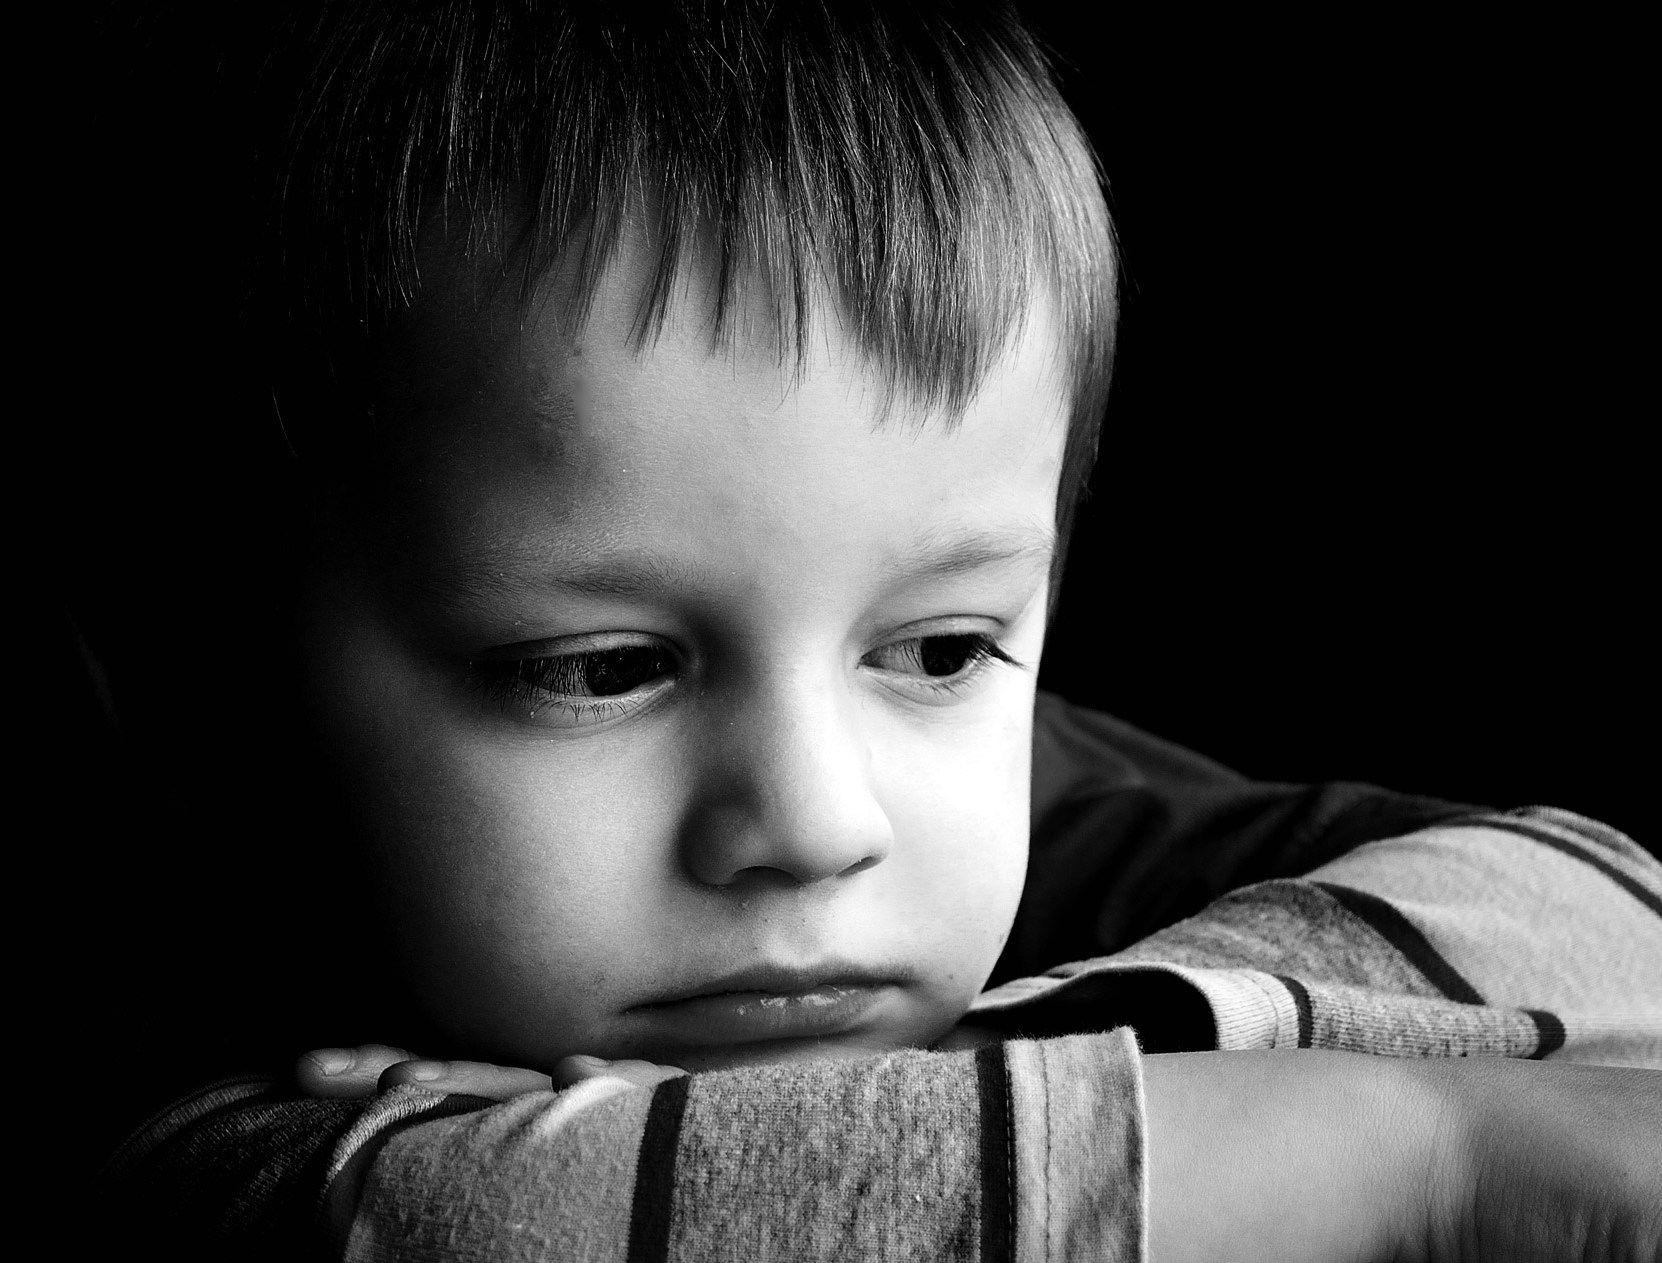 صور اطفال صور بيبي صور اولاد صور حلوين اطفال حلوينصور اطفال صغار2020 49